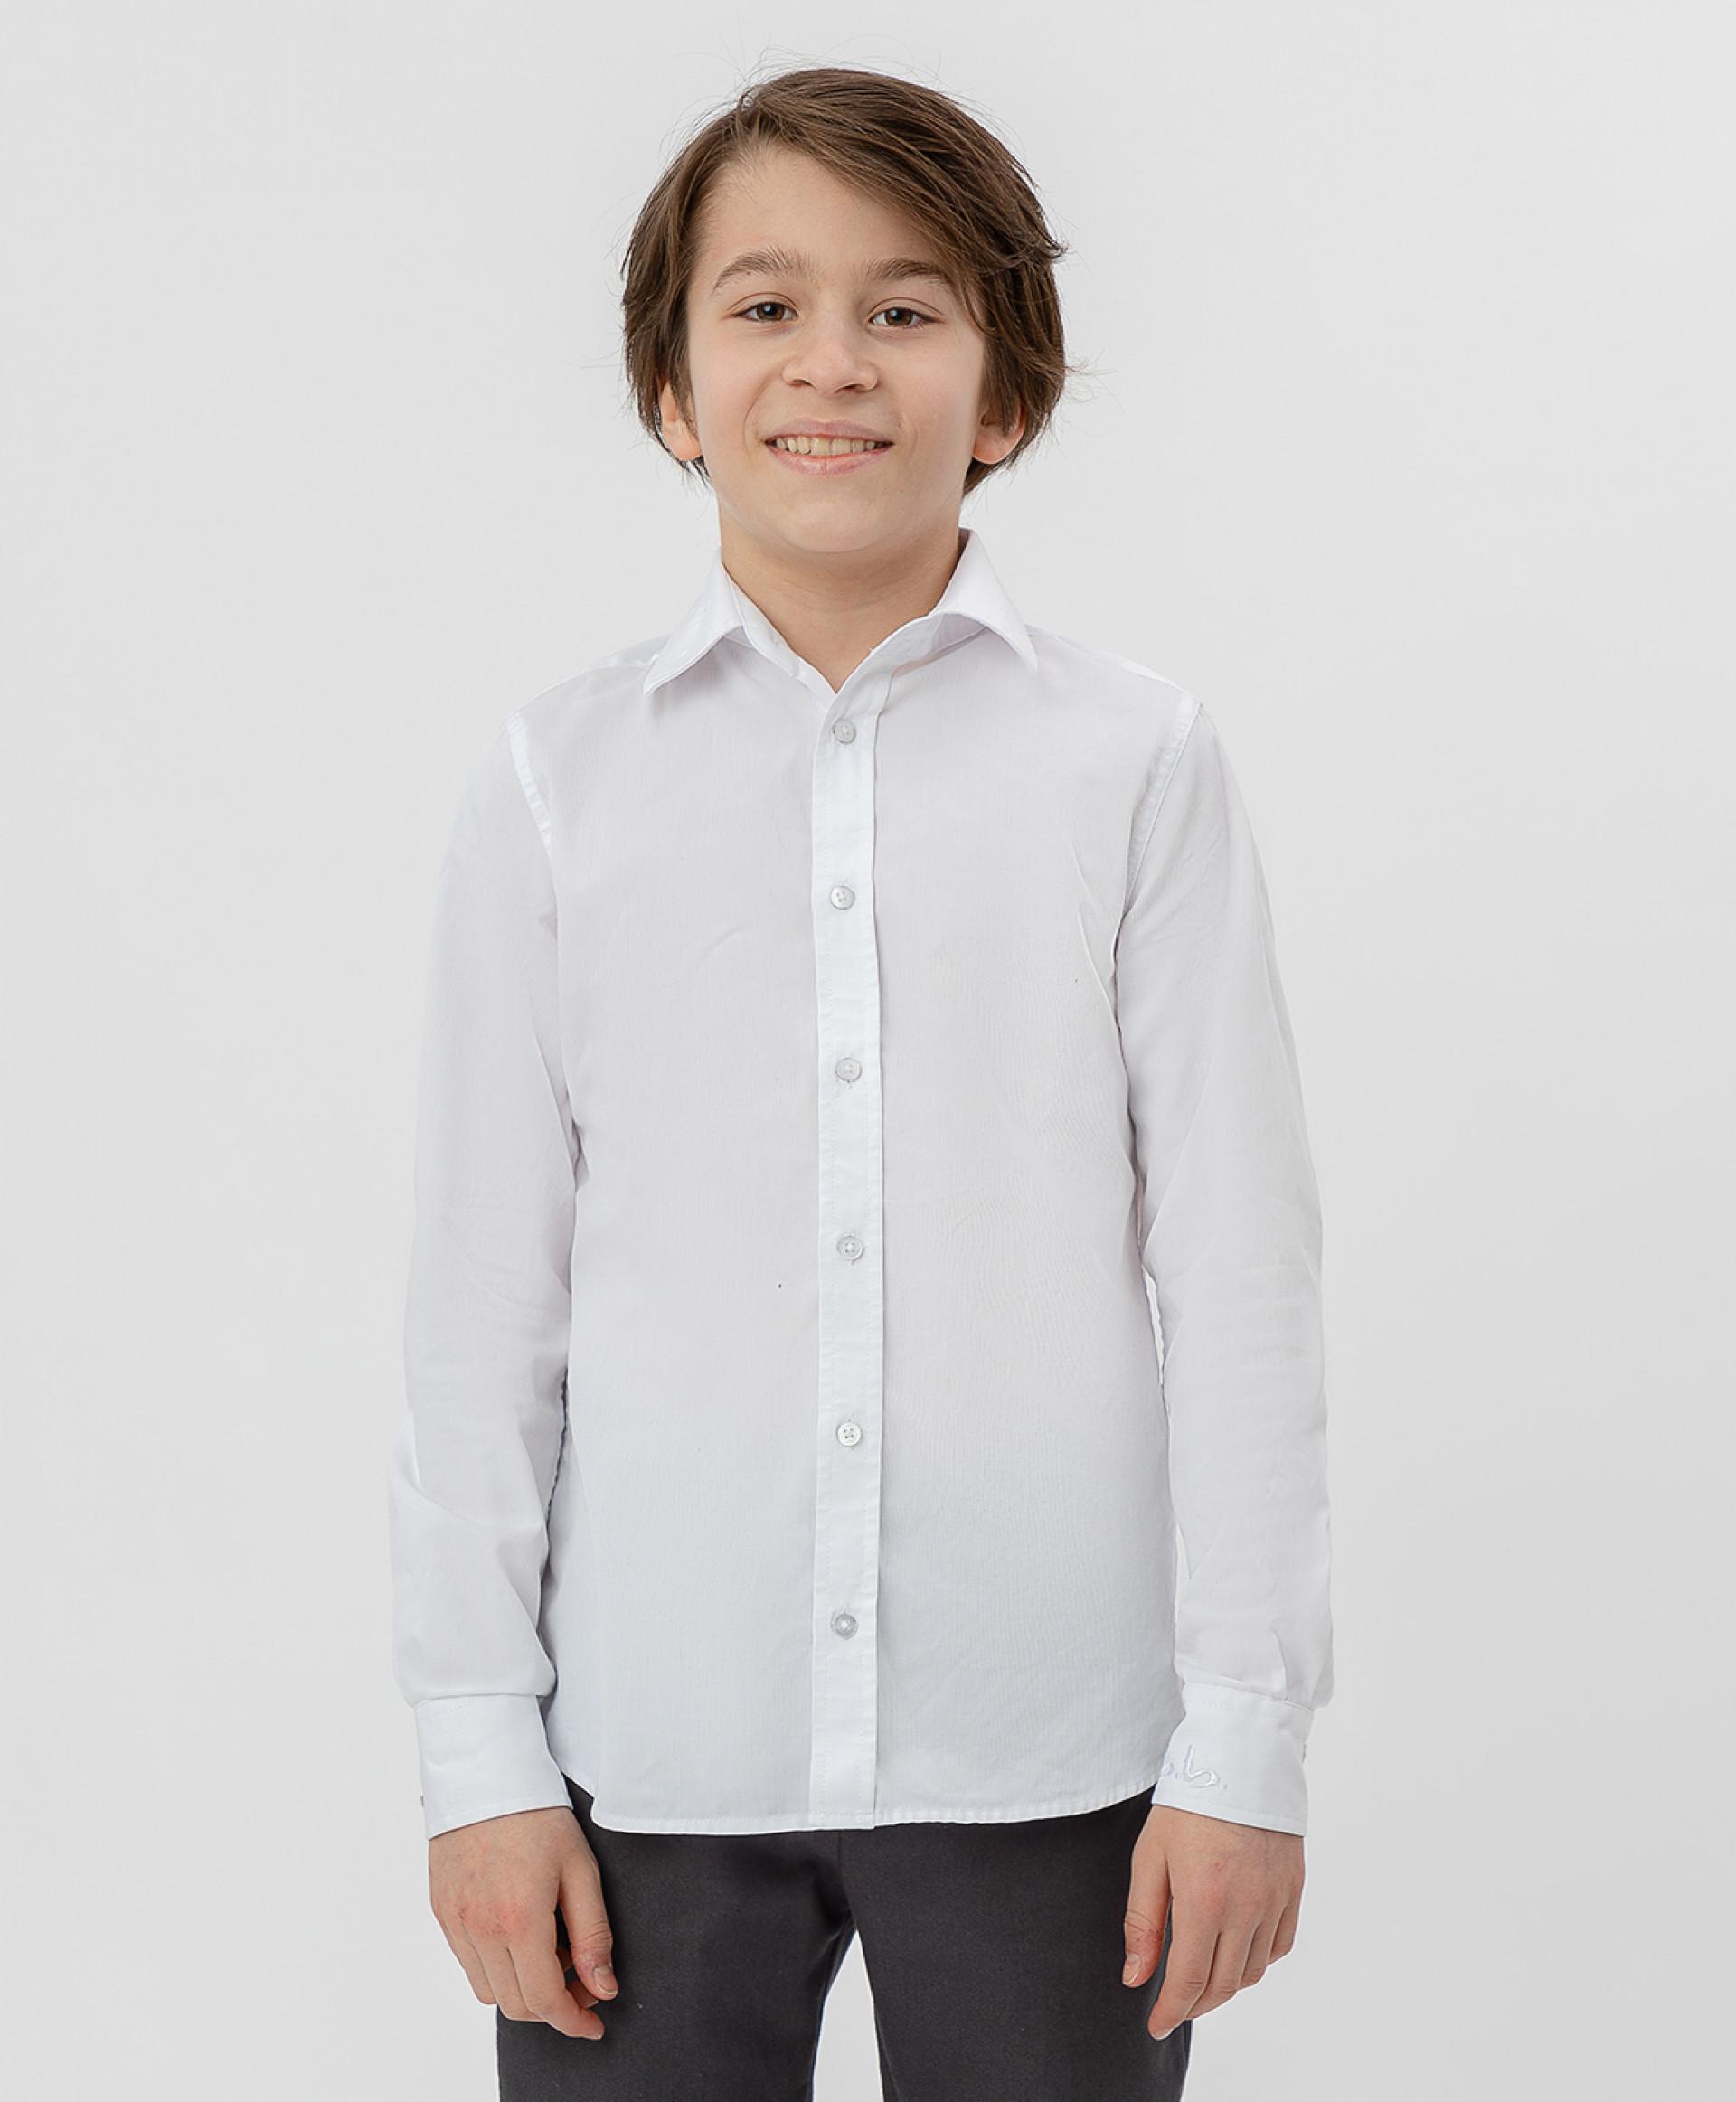 Белая рубашка BUTTON BLUE, модель 220BBBS23020200, размер